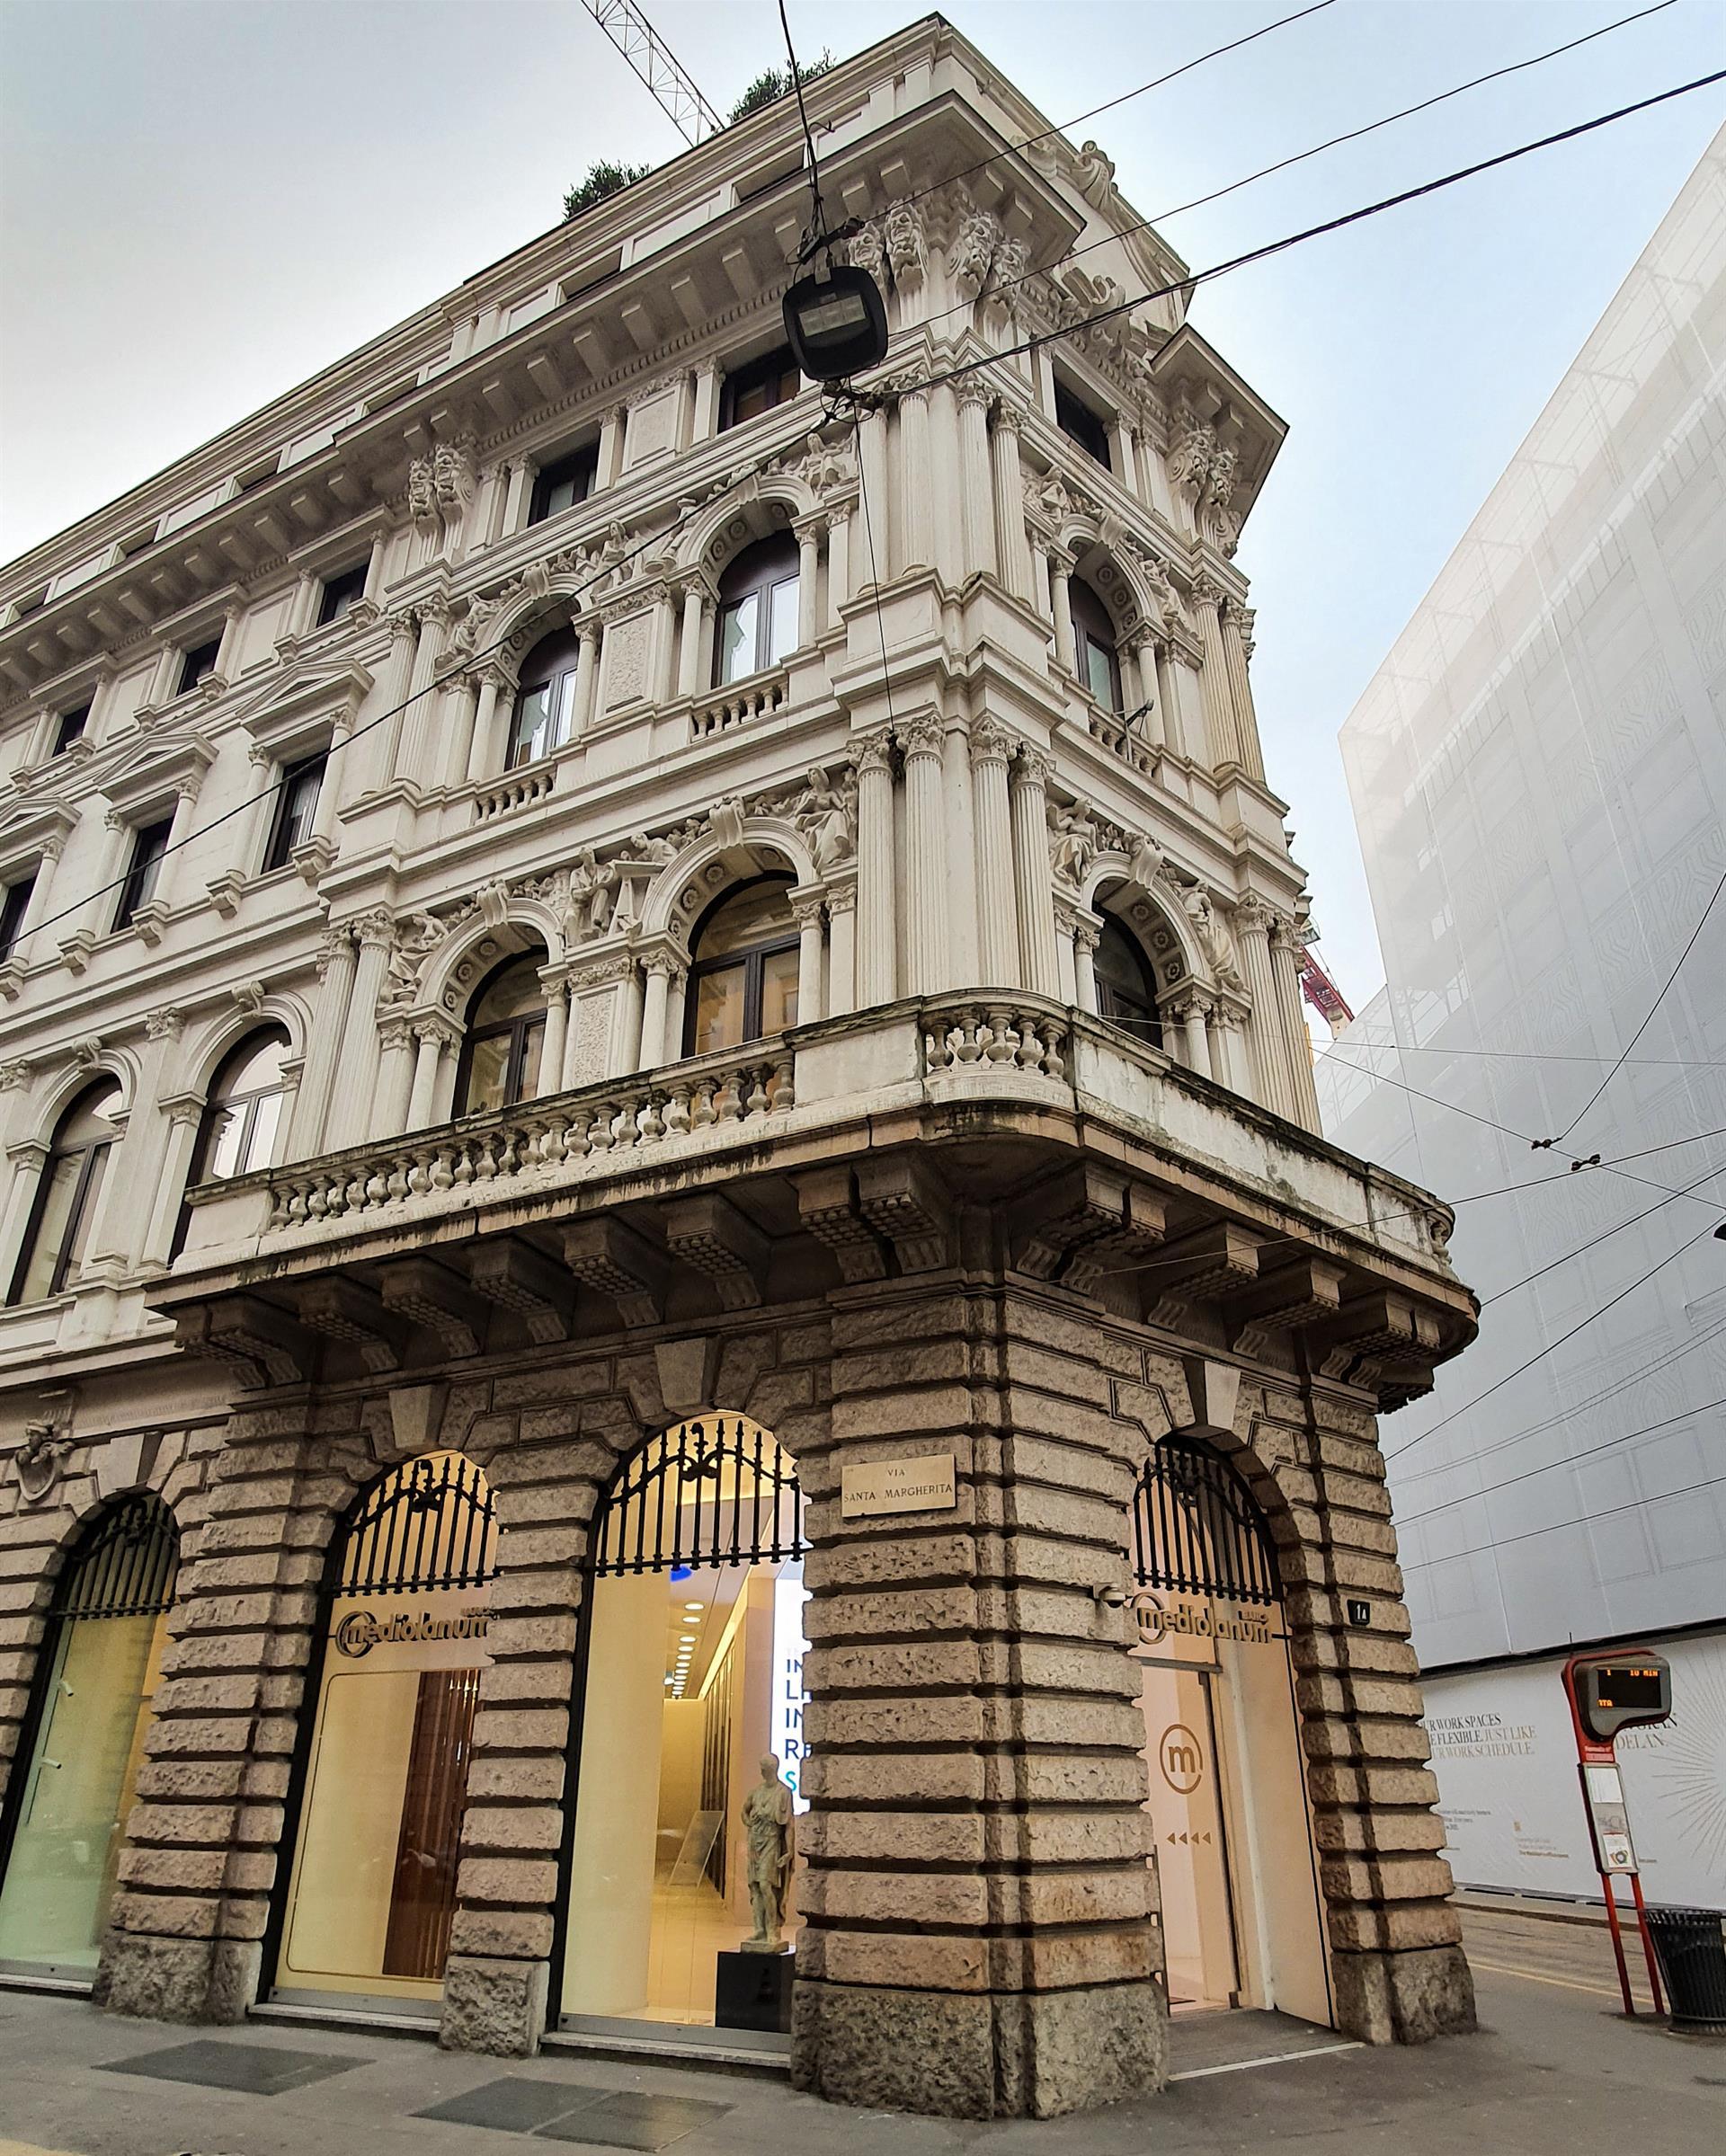 Adotta Una Statua Banca Mediolanum 2